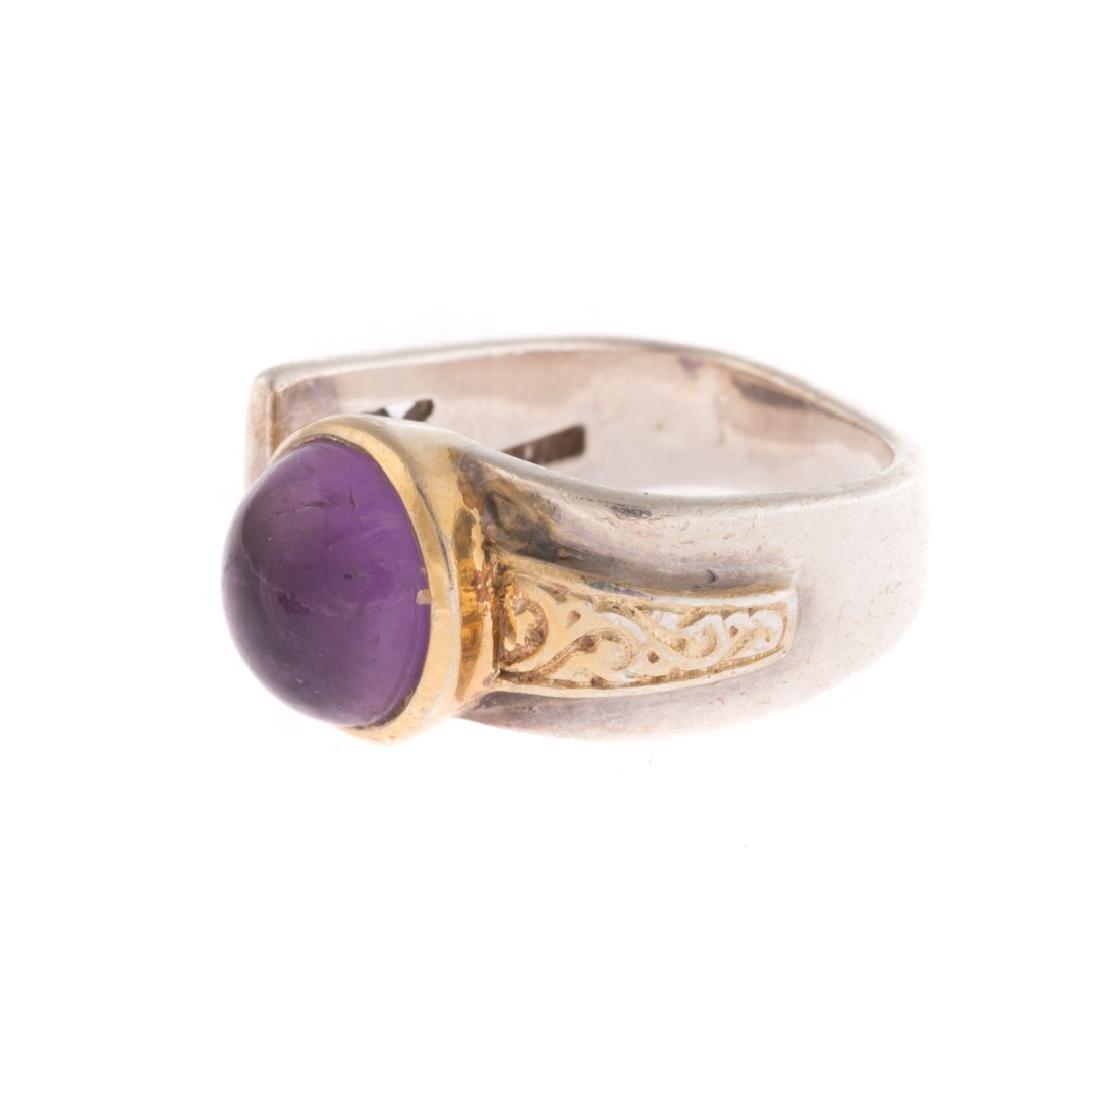 A Contemporary Amethyst Ring & Garnet Earrings - 4